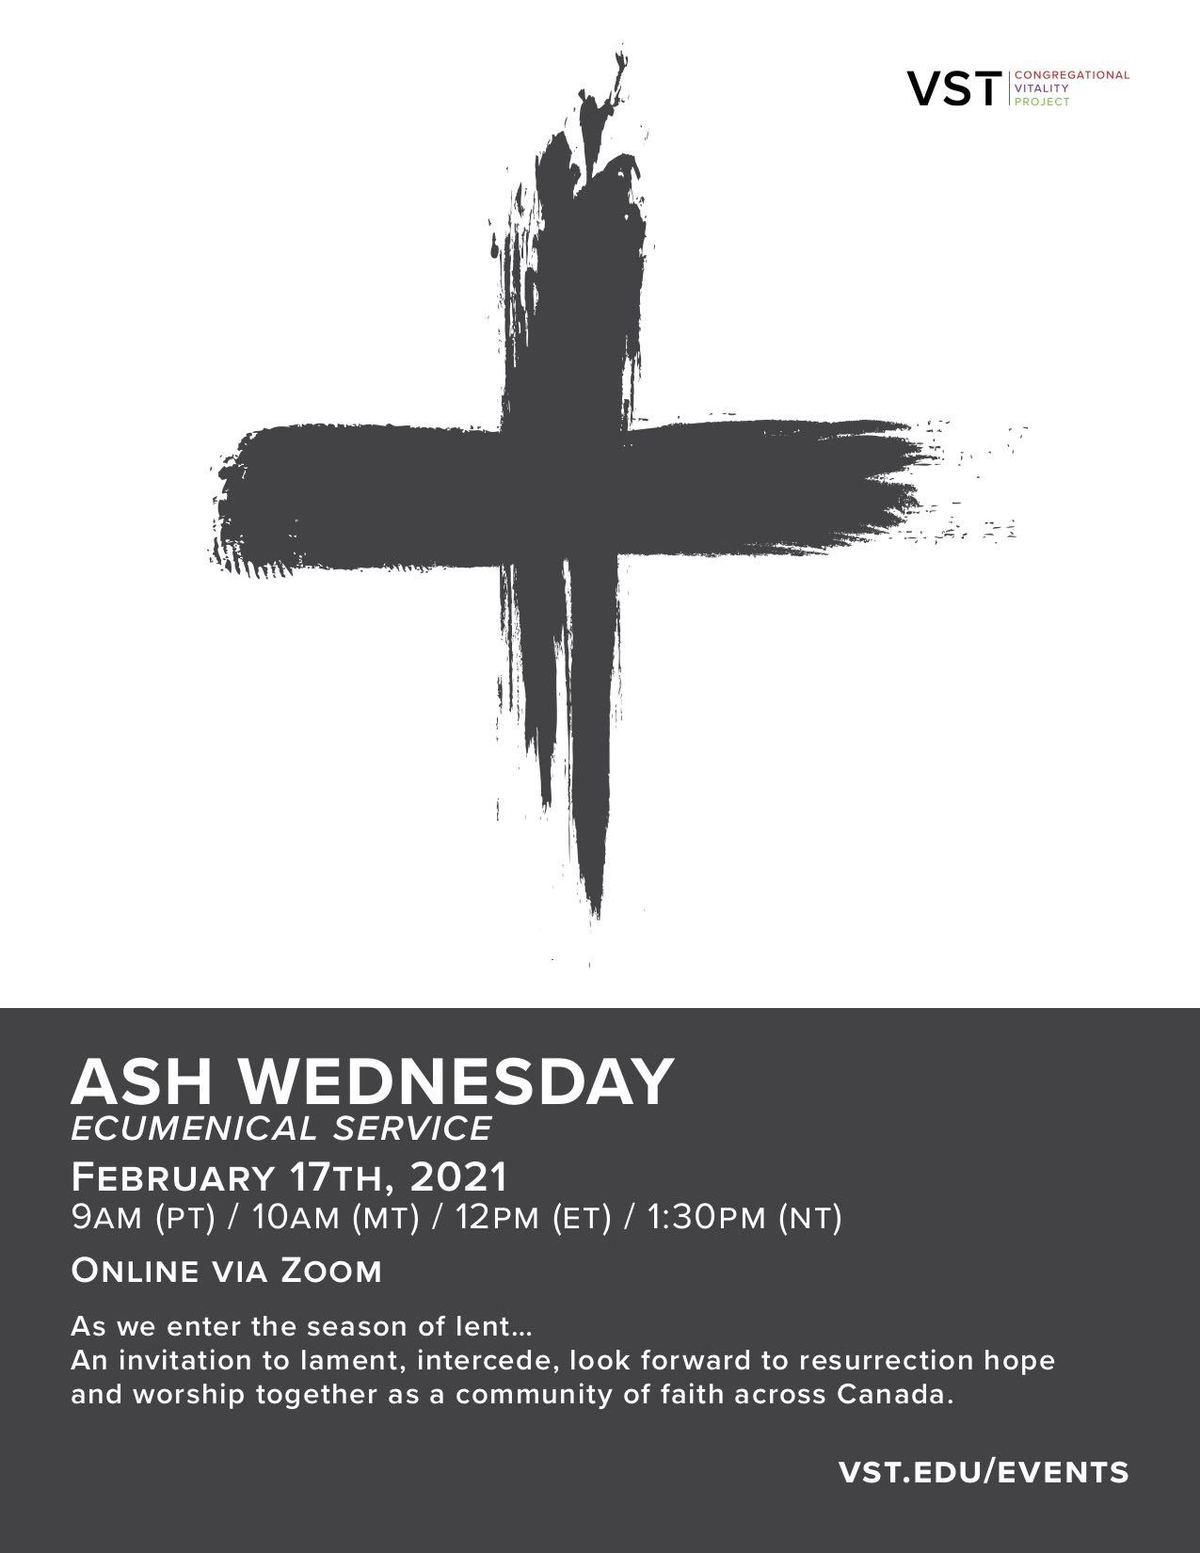 Ash Wednesday Ecumenical Worship | Related Groups ...